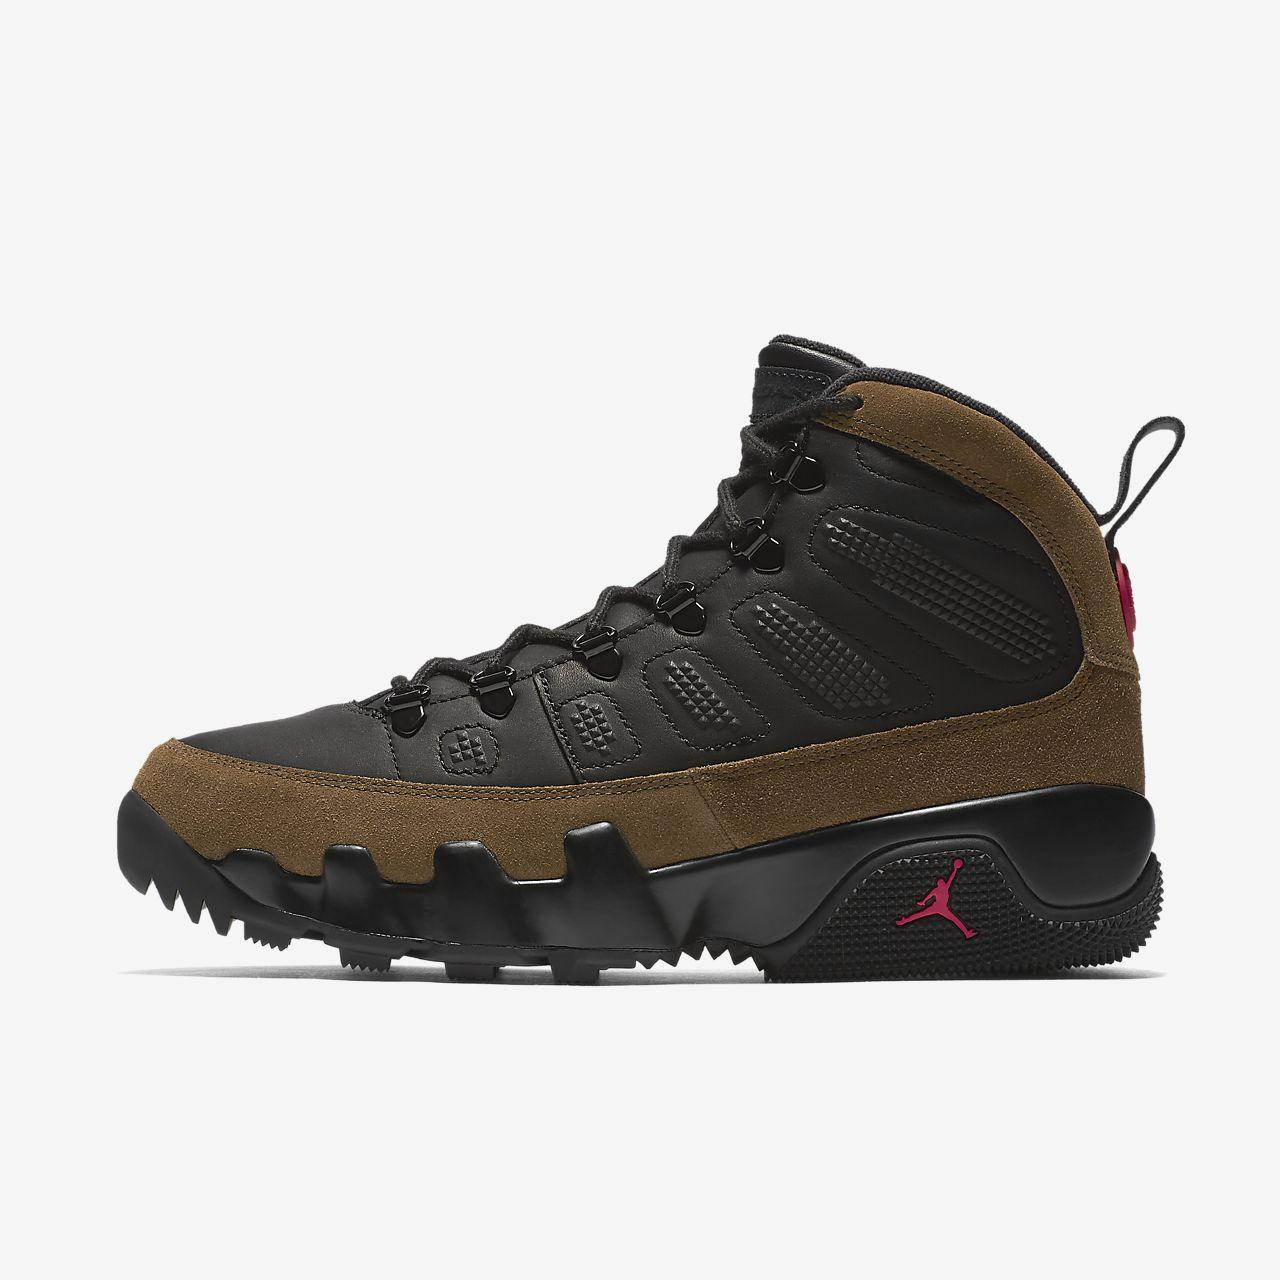 nike air jordan retro 9 nrg boots for girls